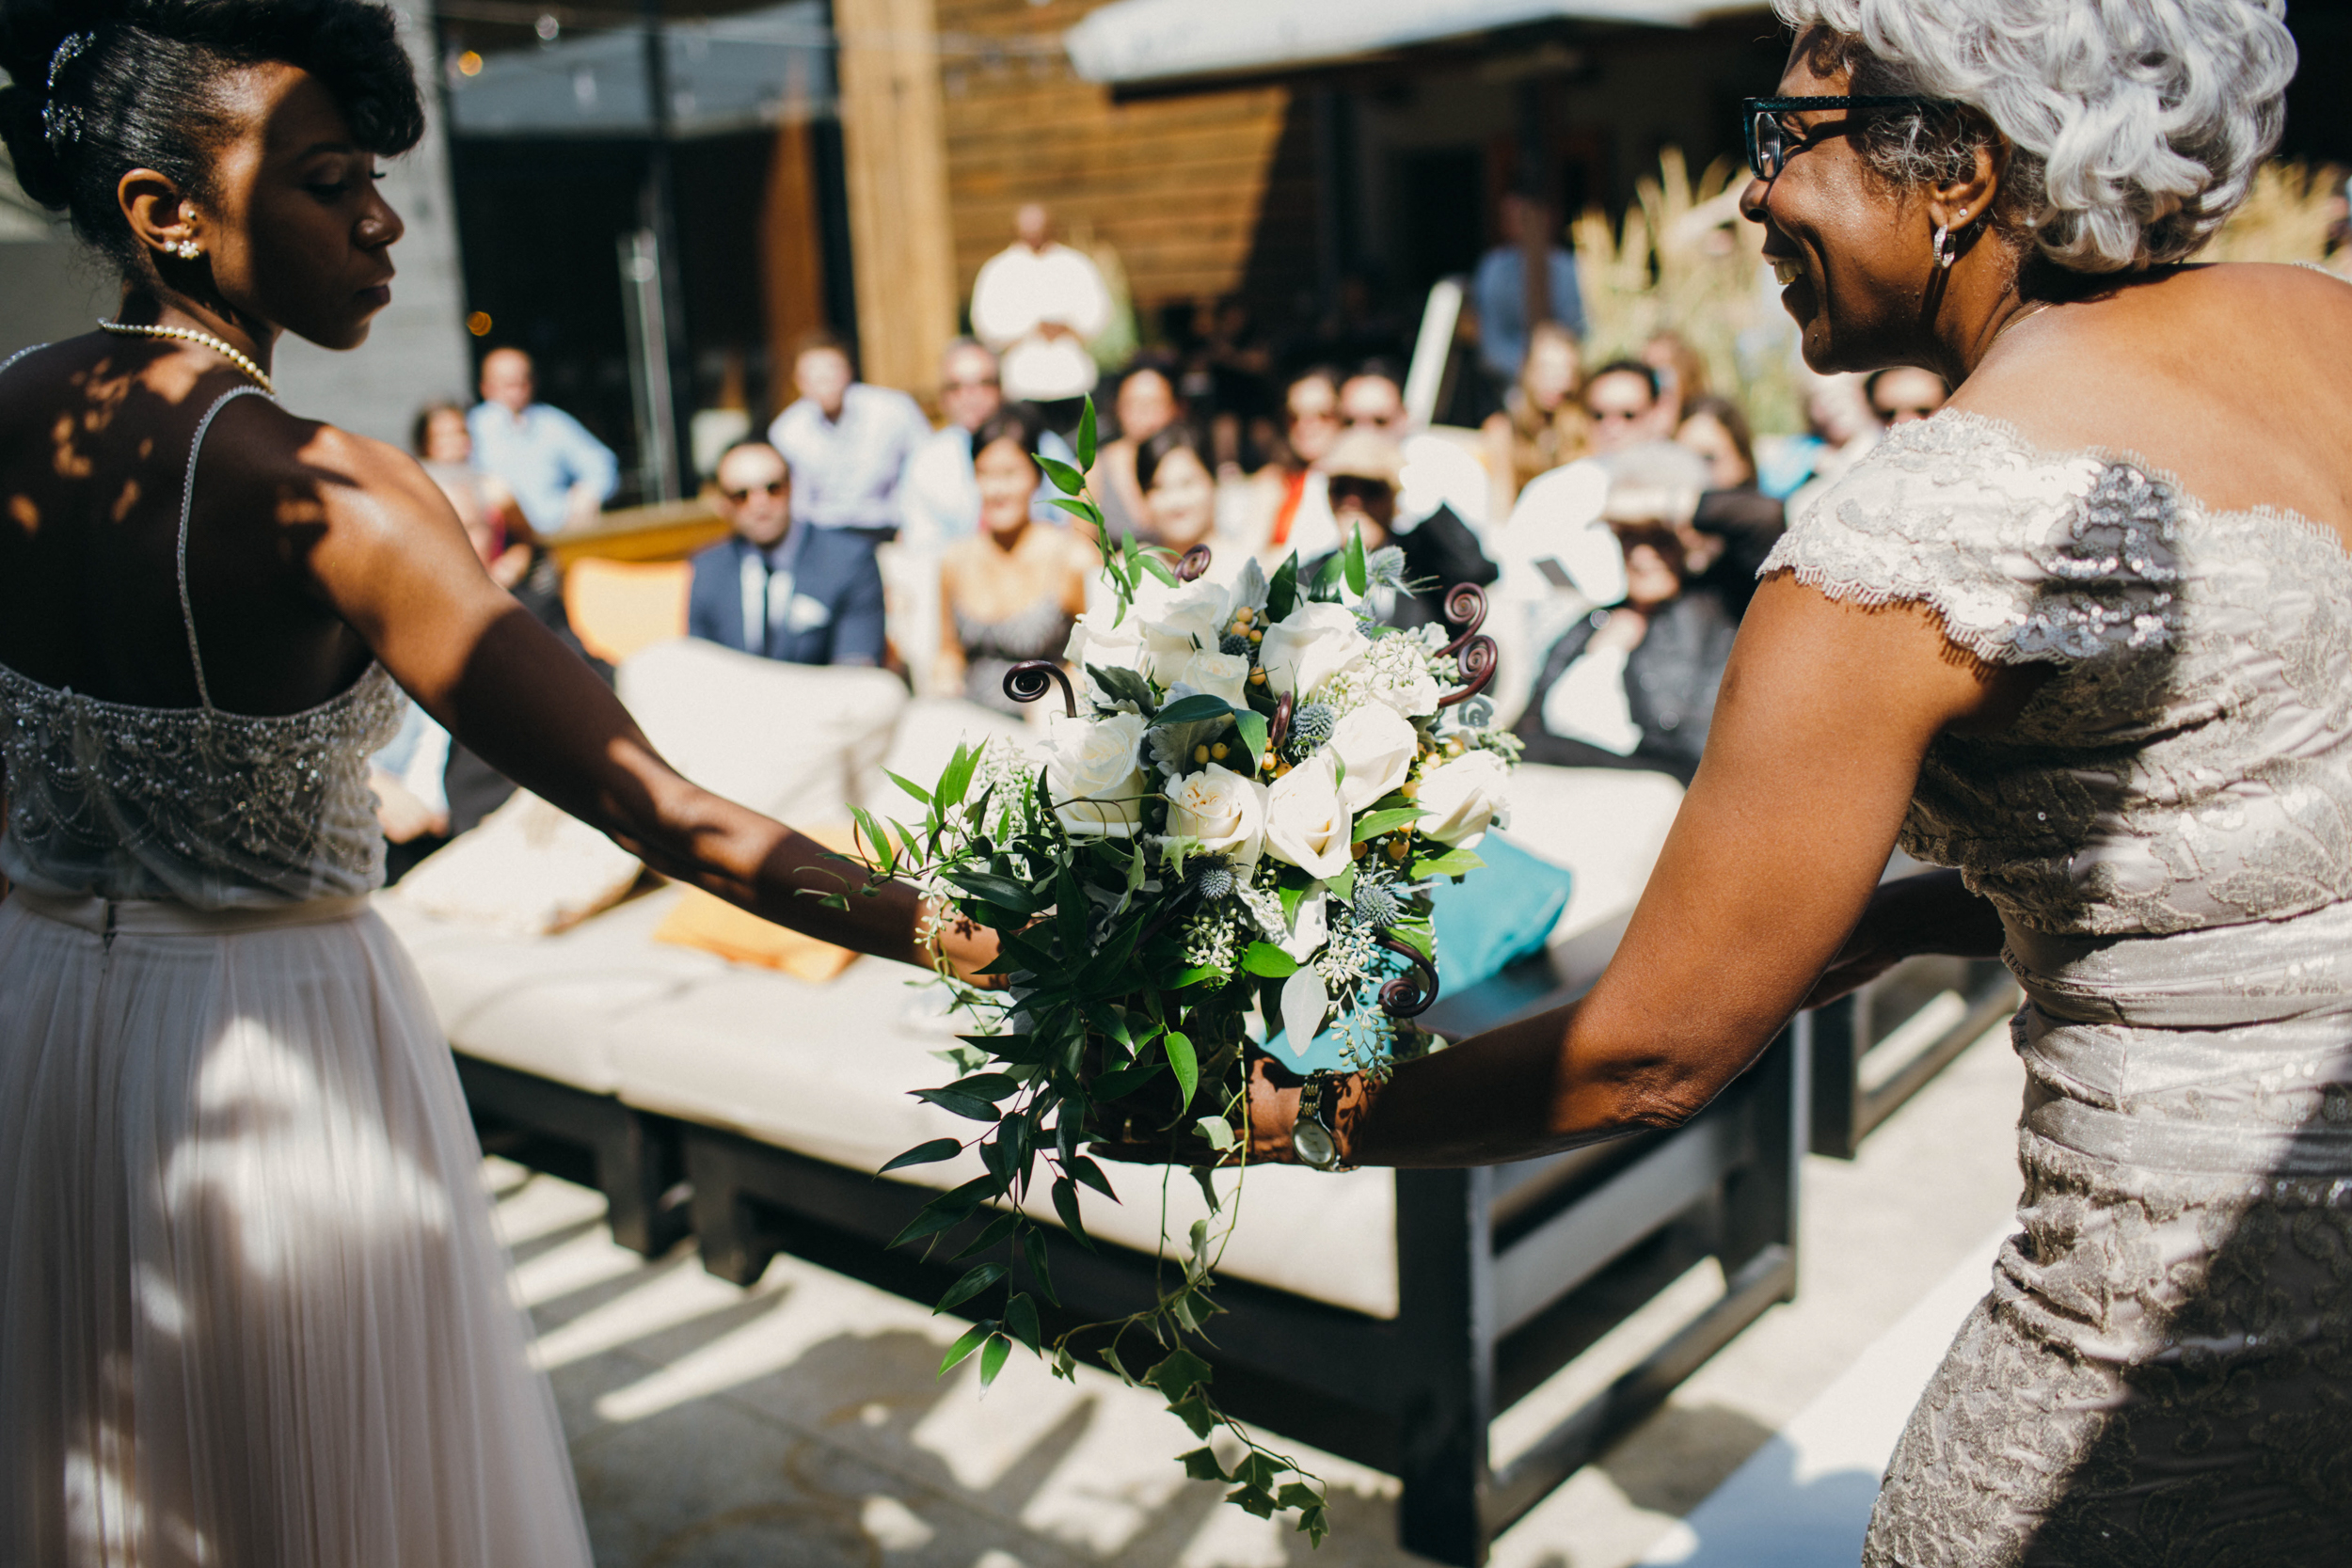 chicago.wedding.urban.intimate.zed451.lake.milton olive park-48.jpg